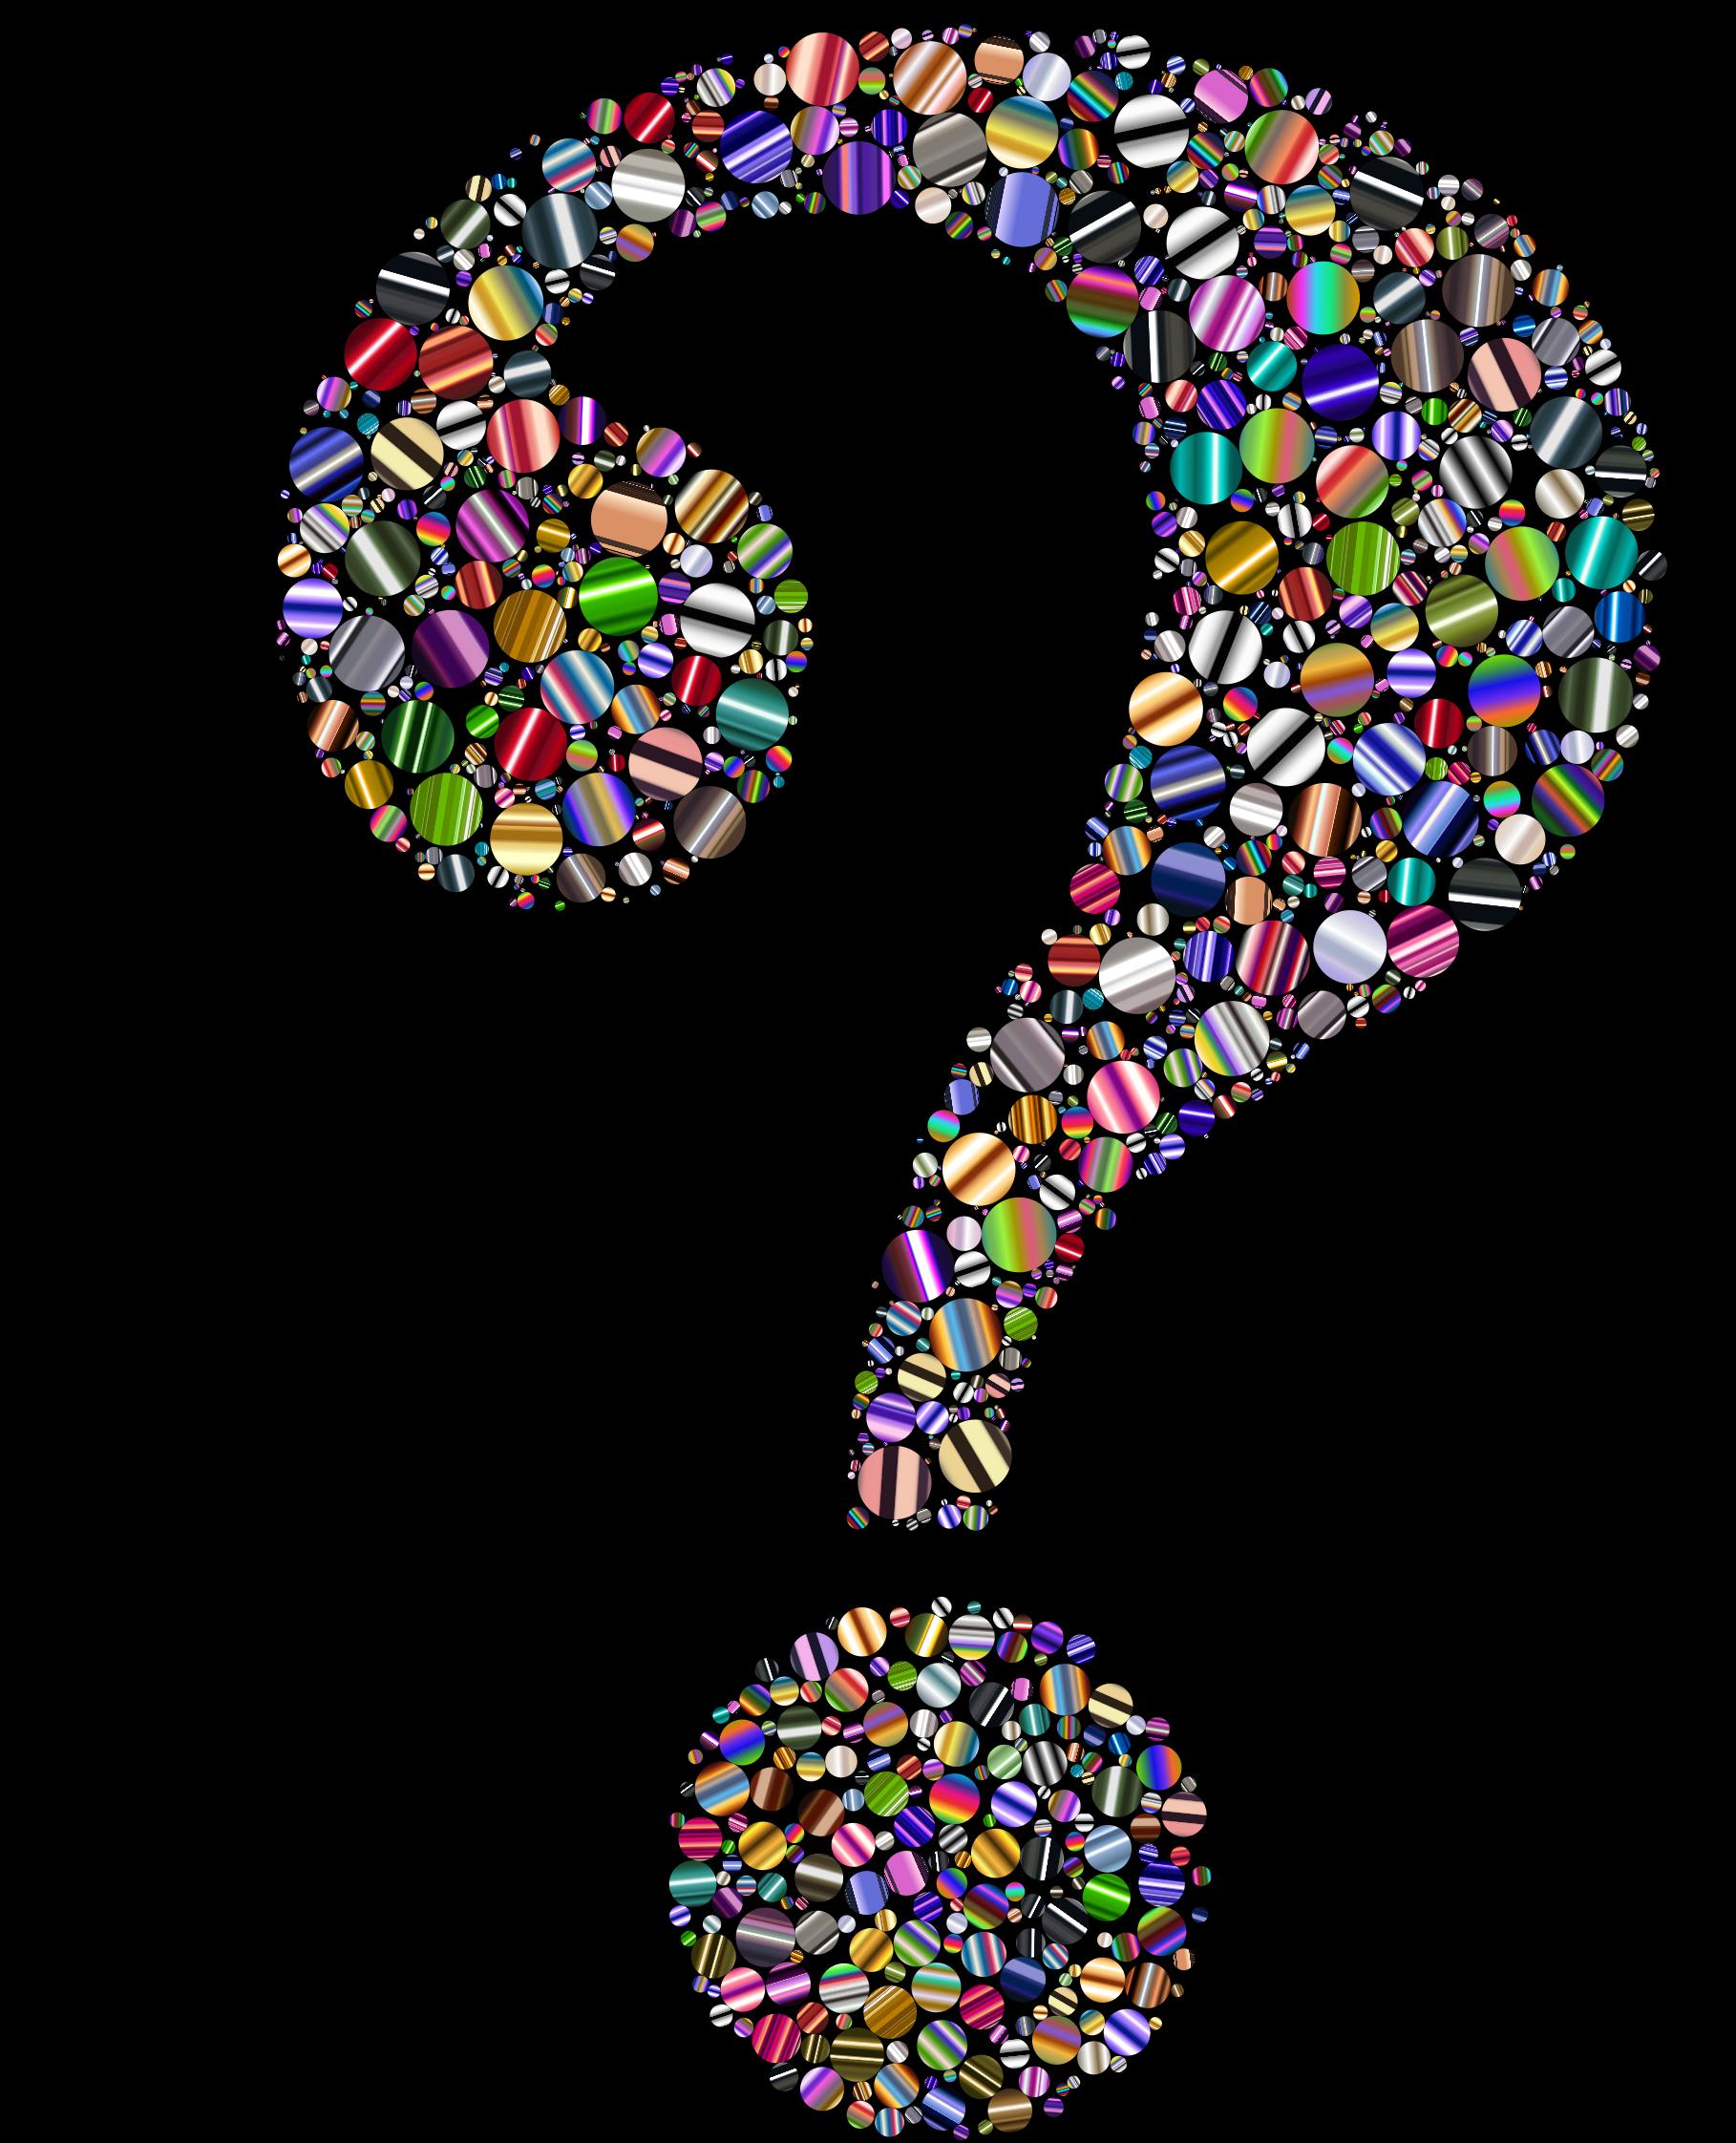 Clipart brain question. Colorful head circles big